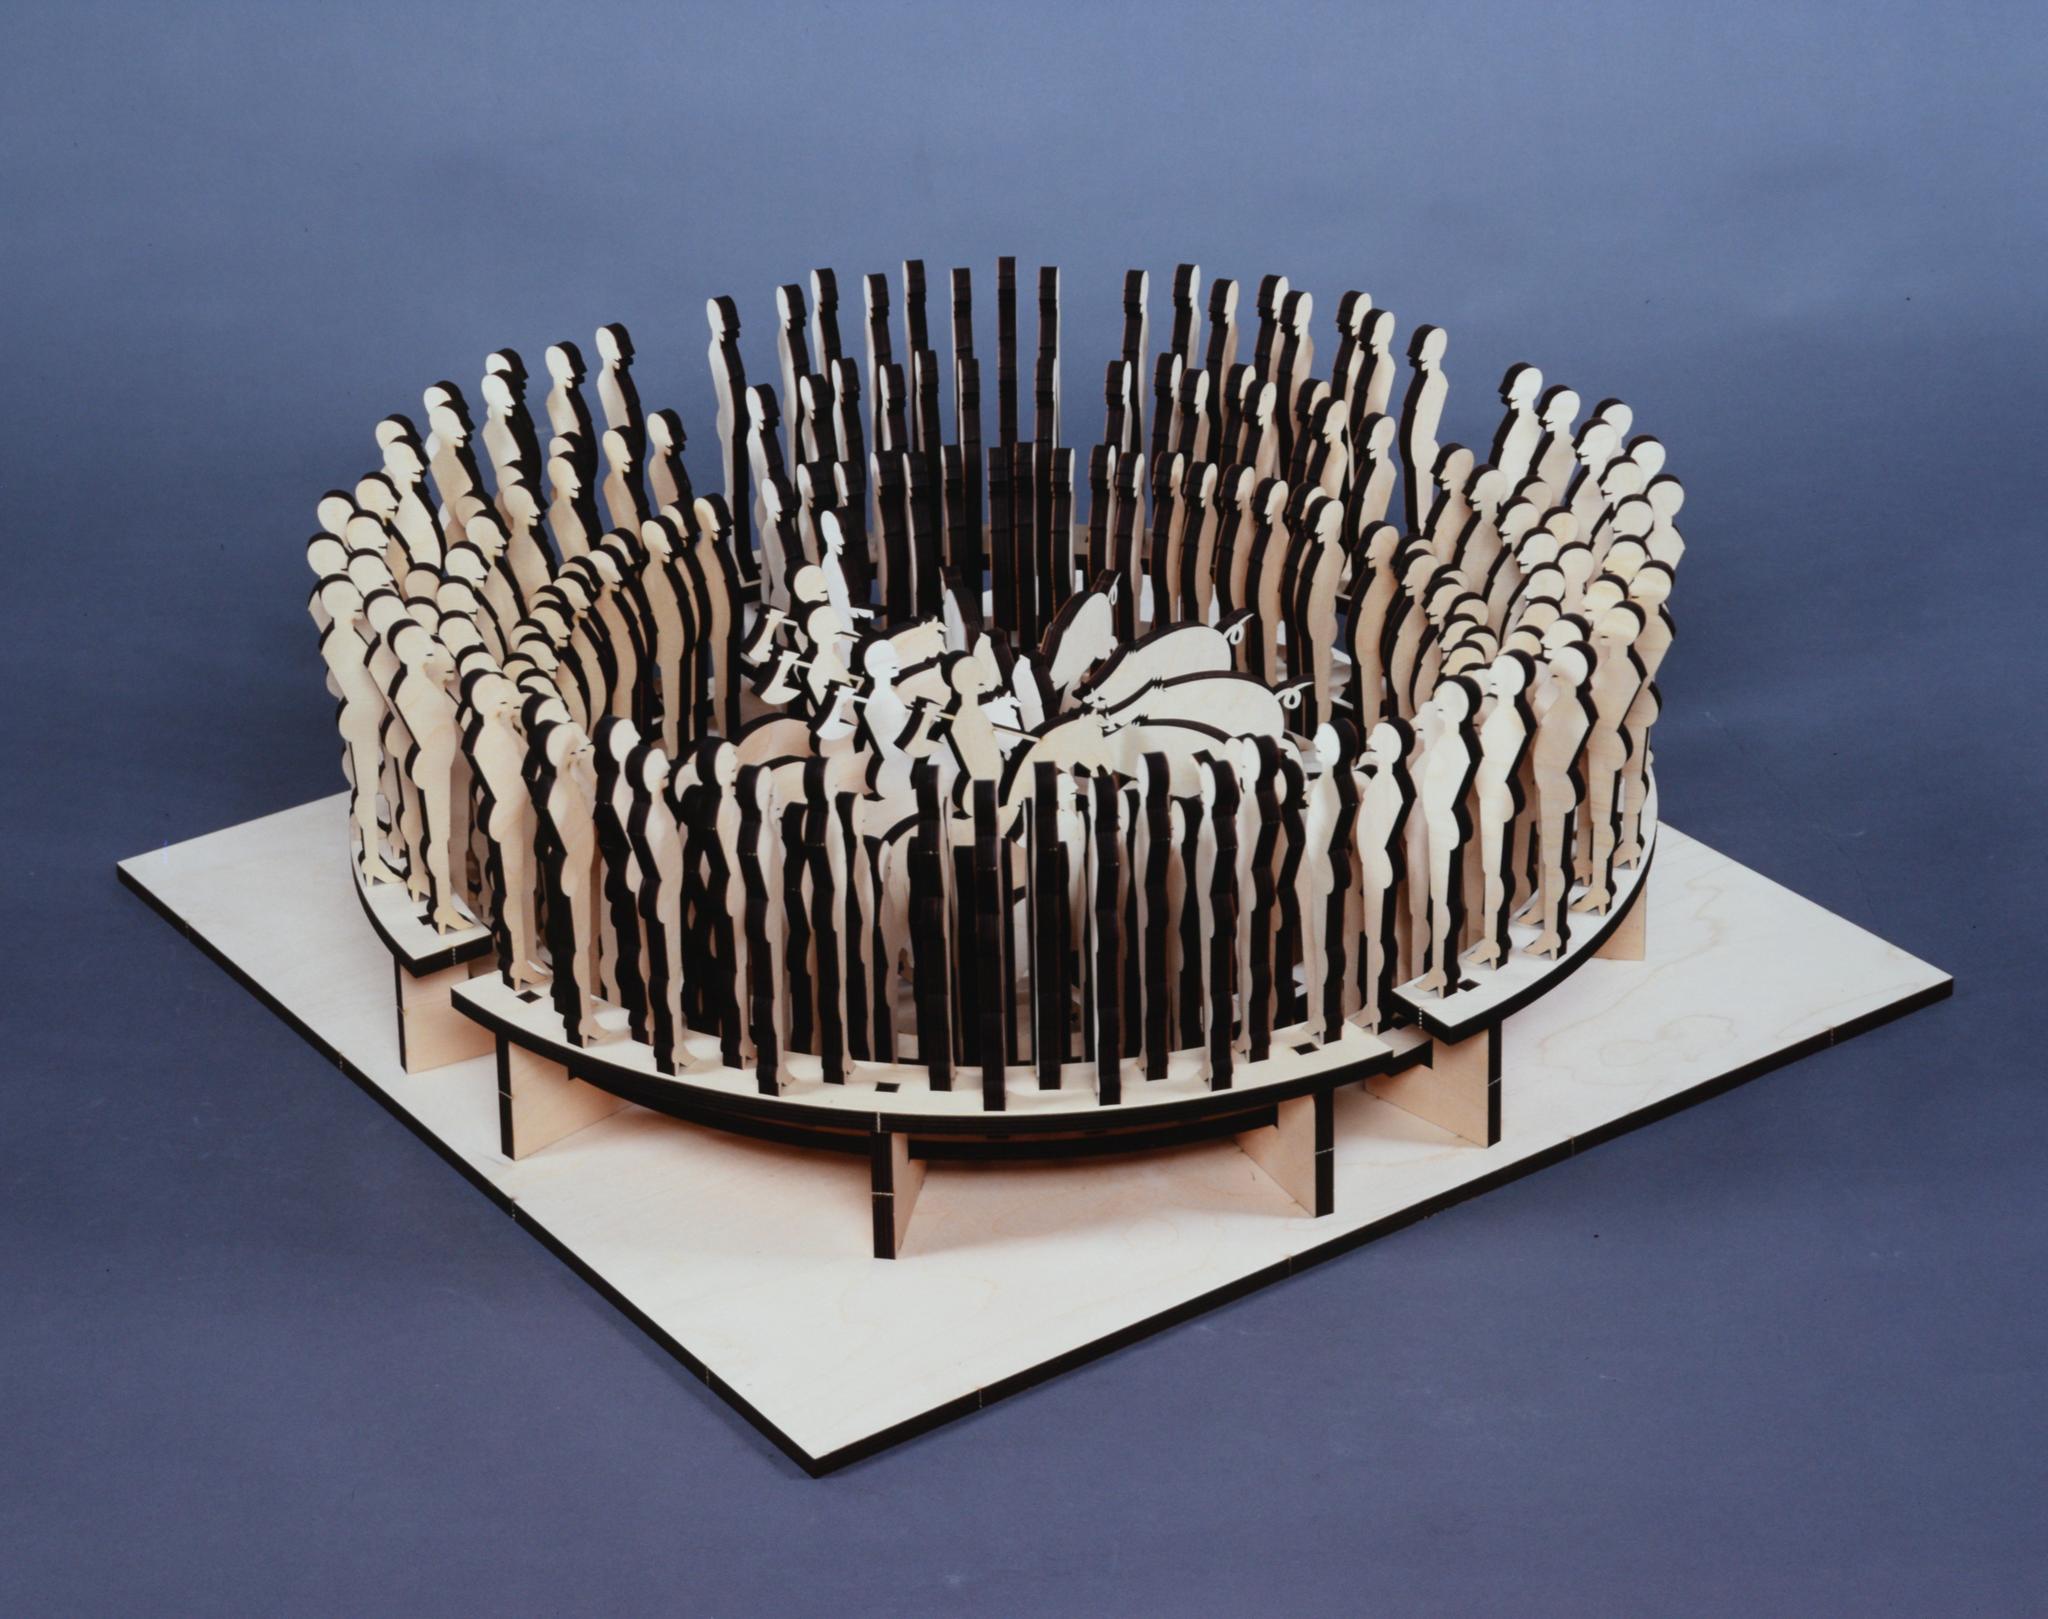 """Zirkus"" 2001, Schichtholz gelasert, 30 x 80 x 83 cm - Foto Hadler"